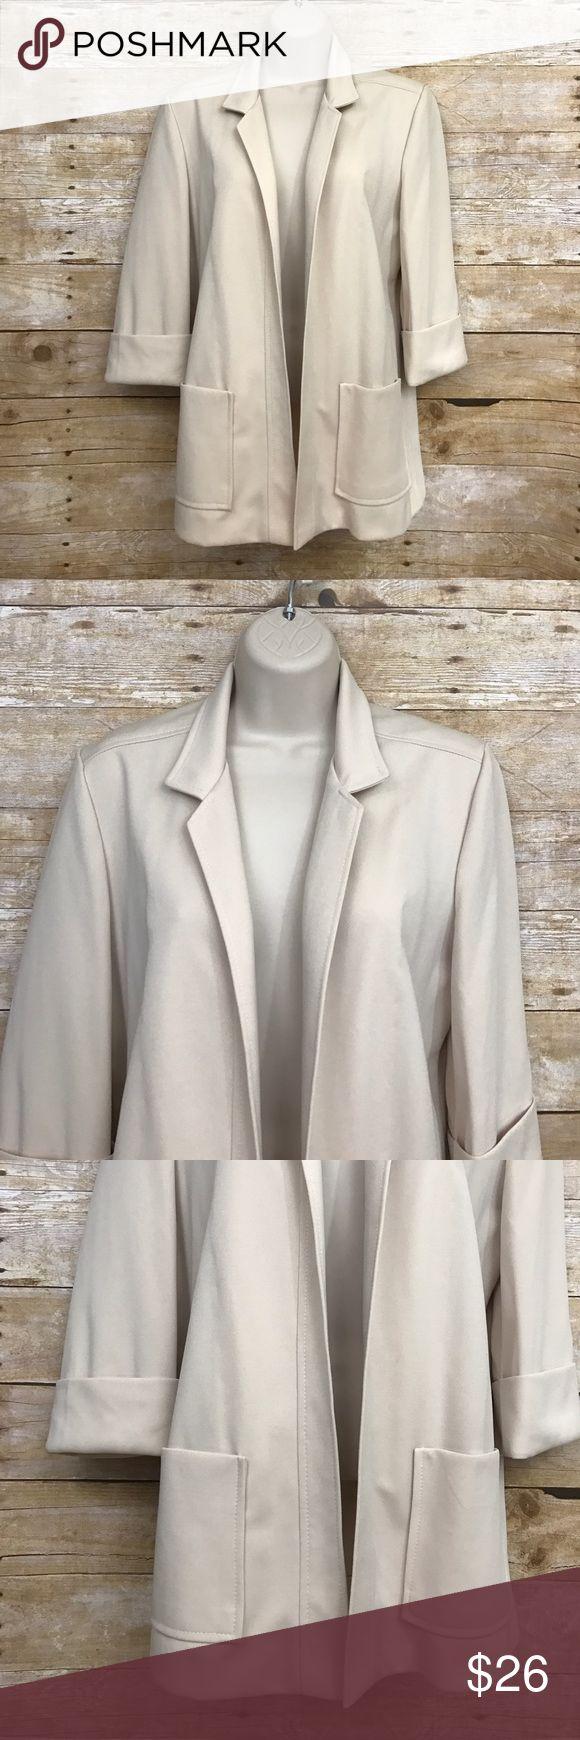 Vintage Devon Cream Dress Blazer - Dress Coat 10 Devon Vintage Brand - Size 10 - cream color - dress cardigan blazer w/ pockets - light thin shoulder pads - excellent condition - please see photos for measurements -                 💥FAST SHIPPING💥 Devon Jackets & Coats Blazers